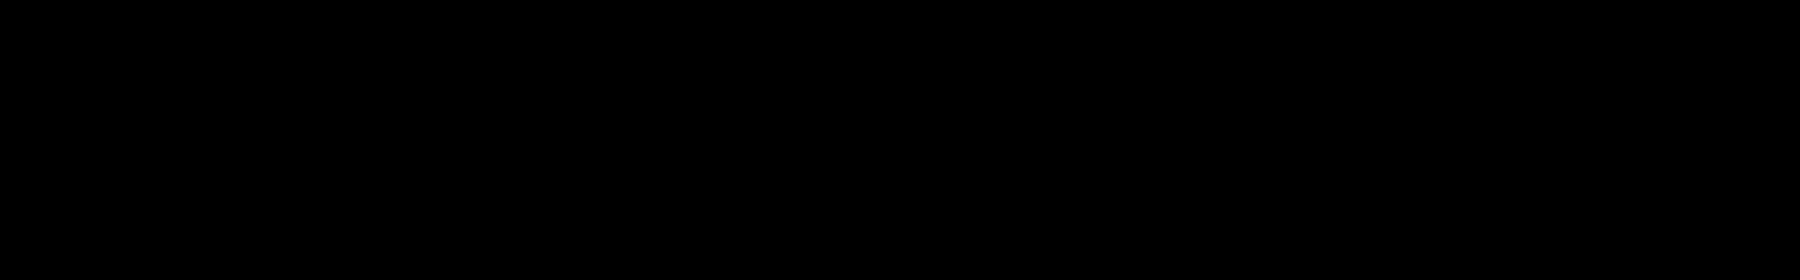 Synthetik for DIVA audio waveform